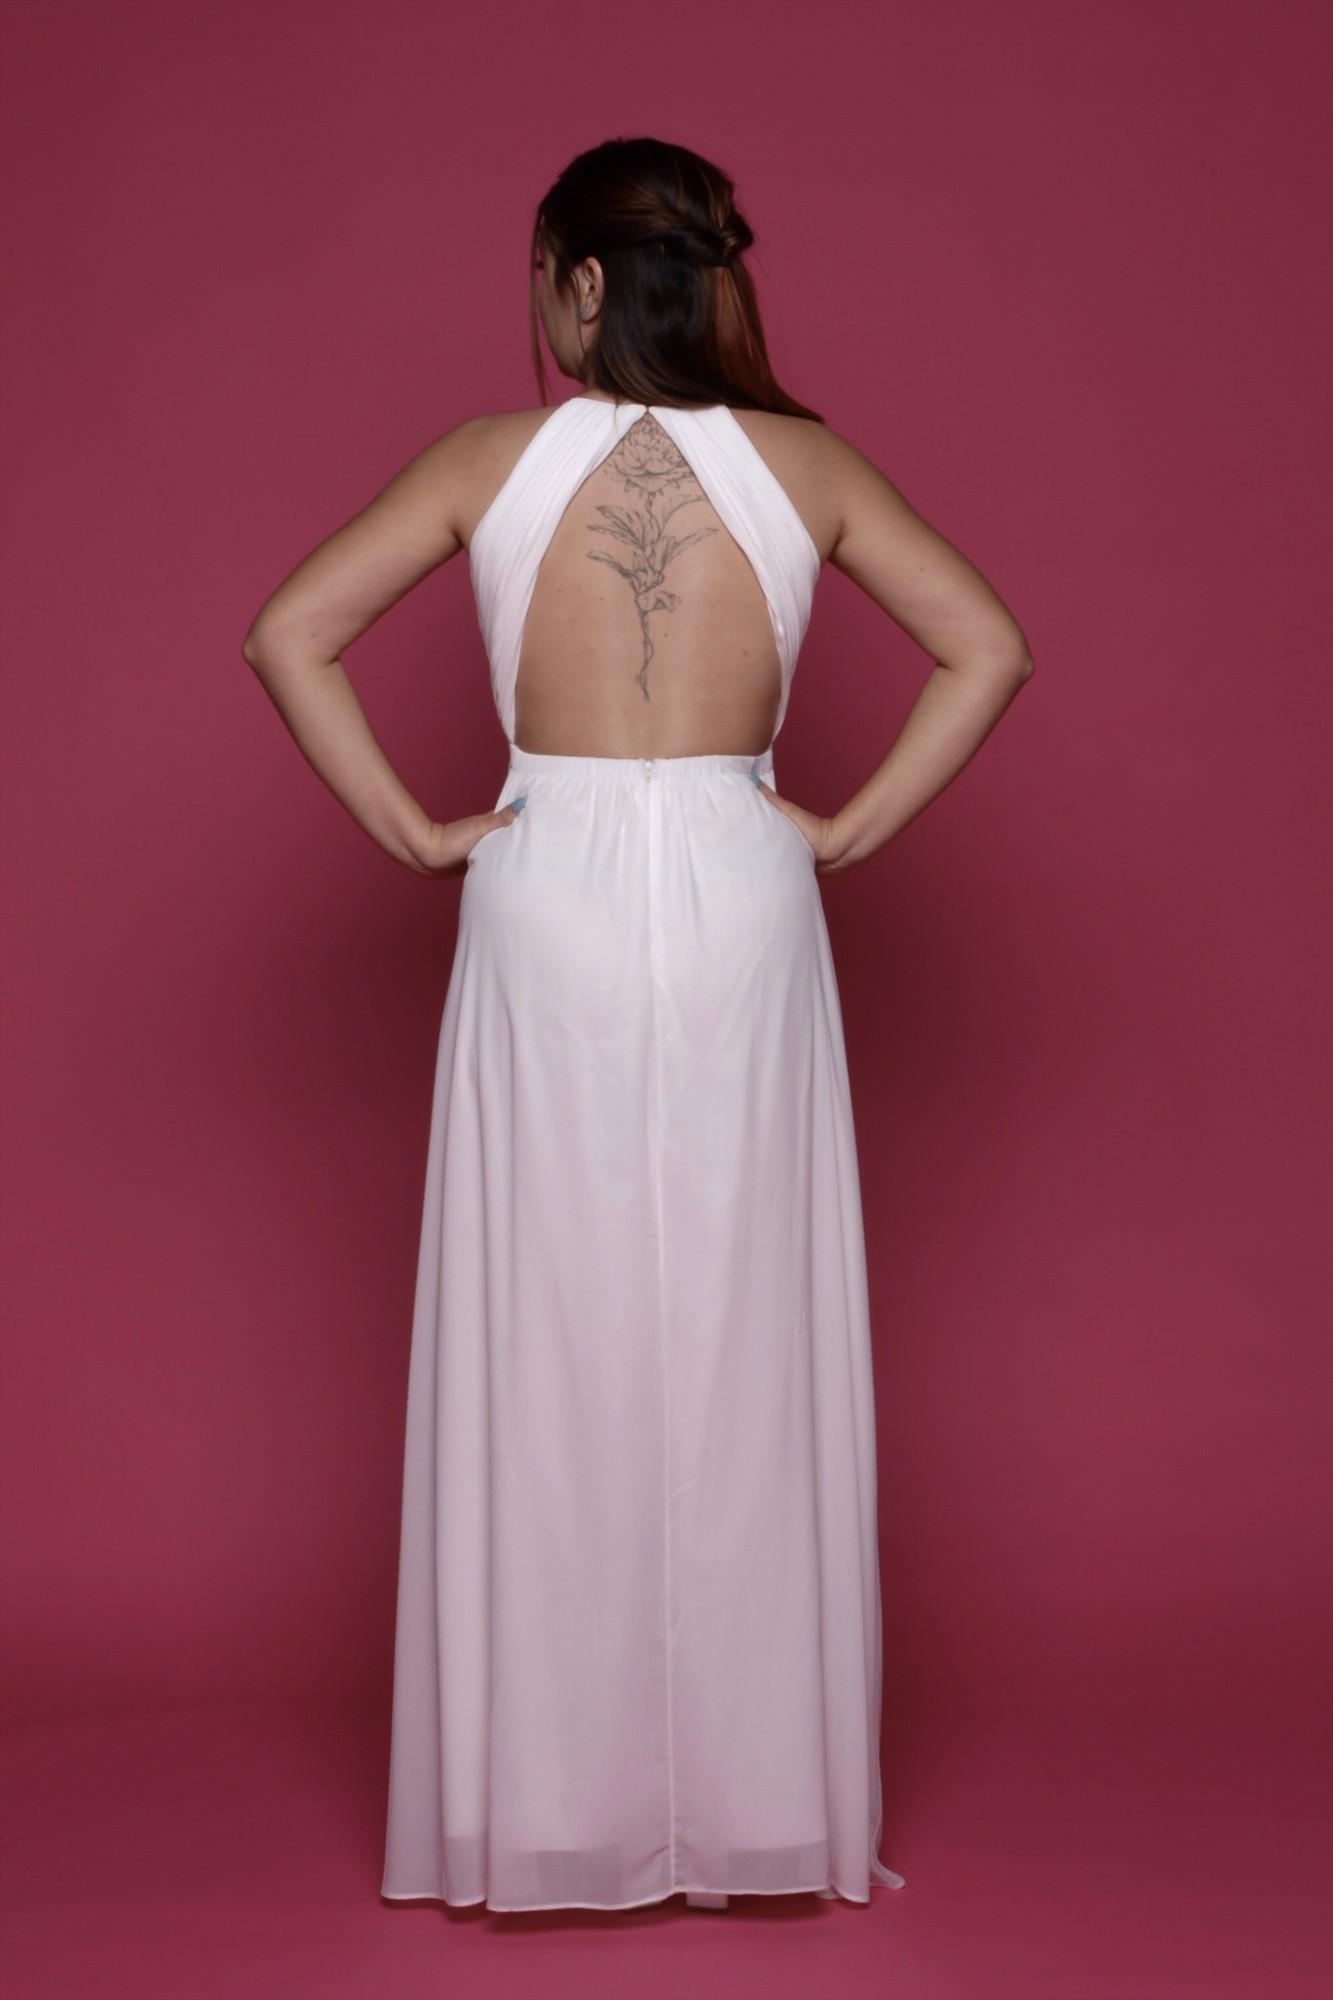 Robe de Coeur - Robe de mariée - Albi - Tarn - robe neuve - petit budget - eva et lola